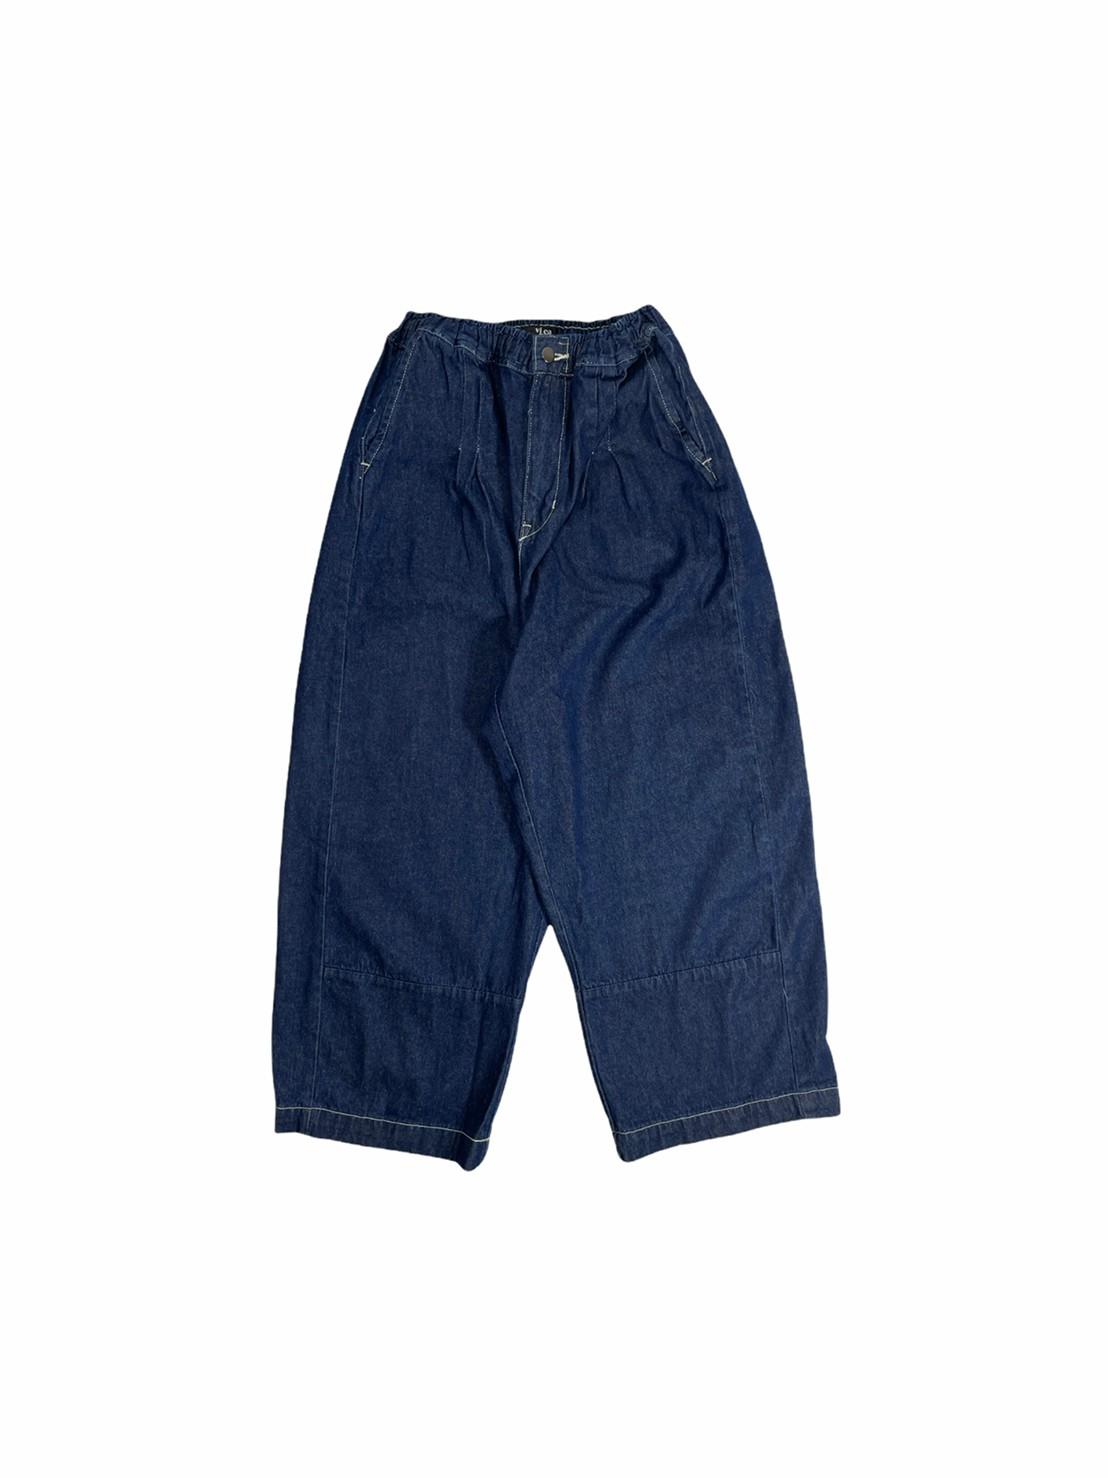 Vineca Balloon-leg Jeans (Indigo)